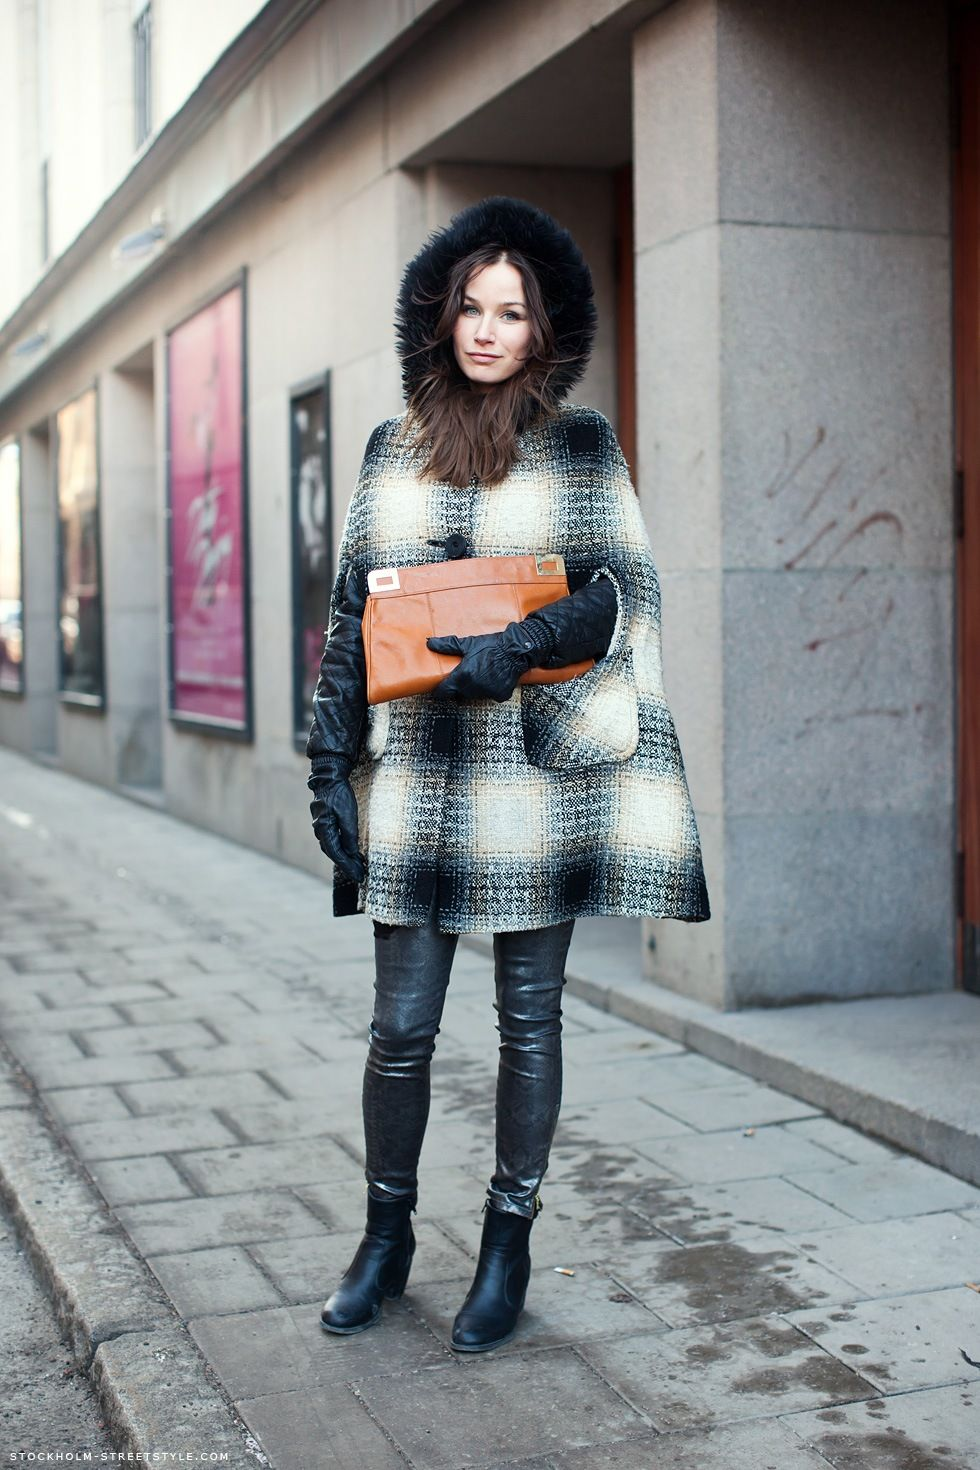 stockholm-street-style-10.jpg